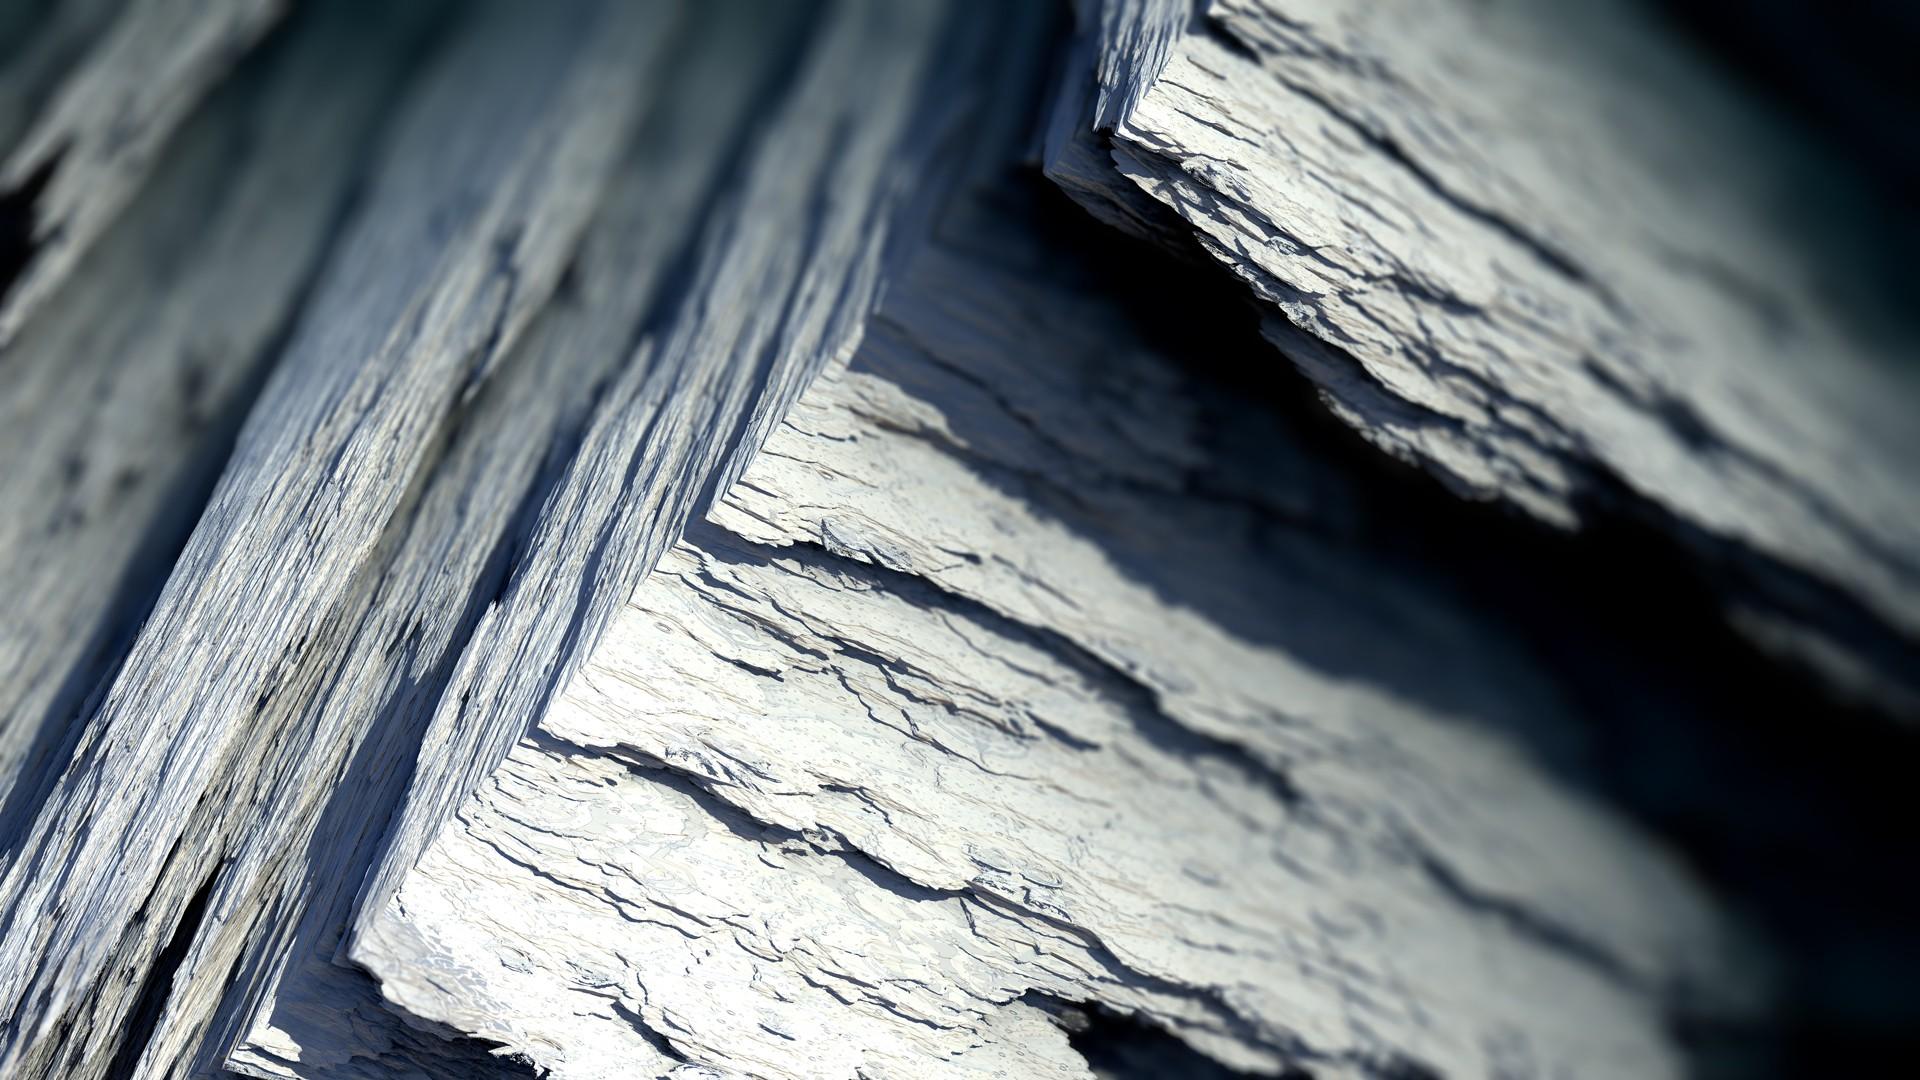 General 1920x1080 Procedural Minerals mineral abstract CGI render digital art artwork gray